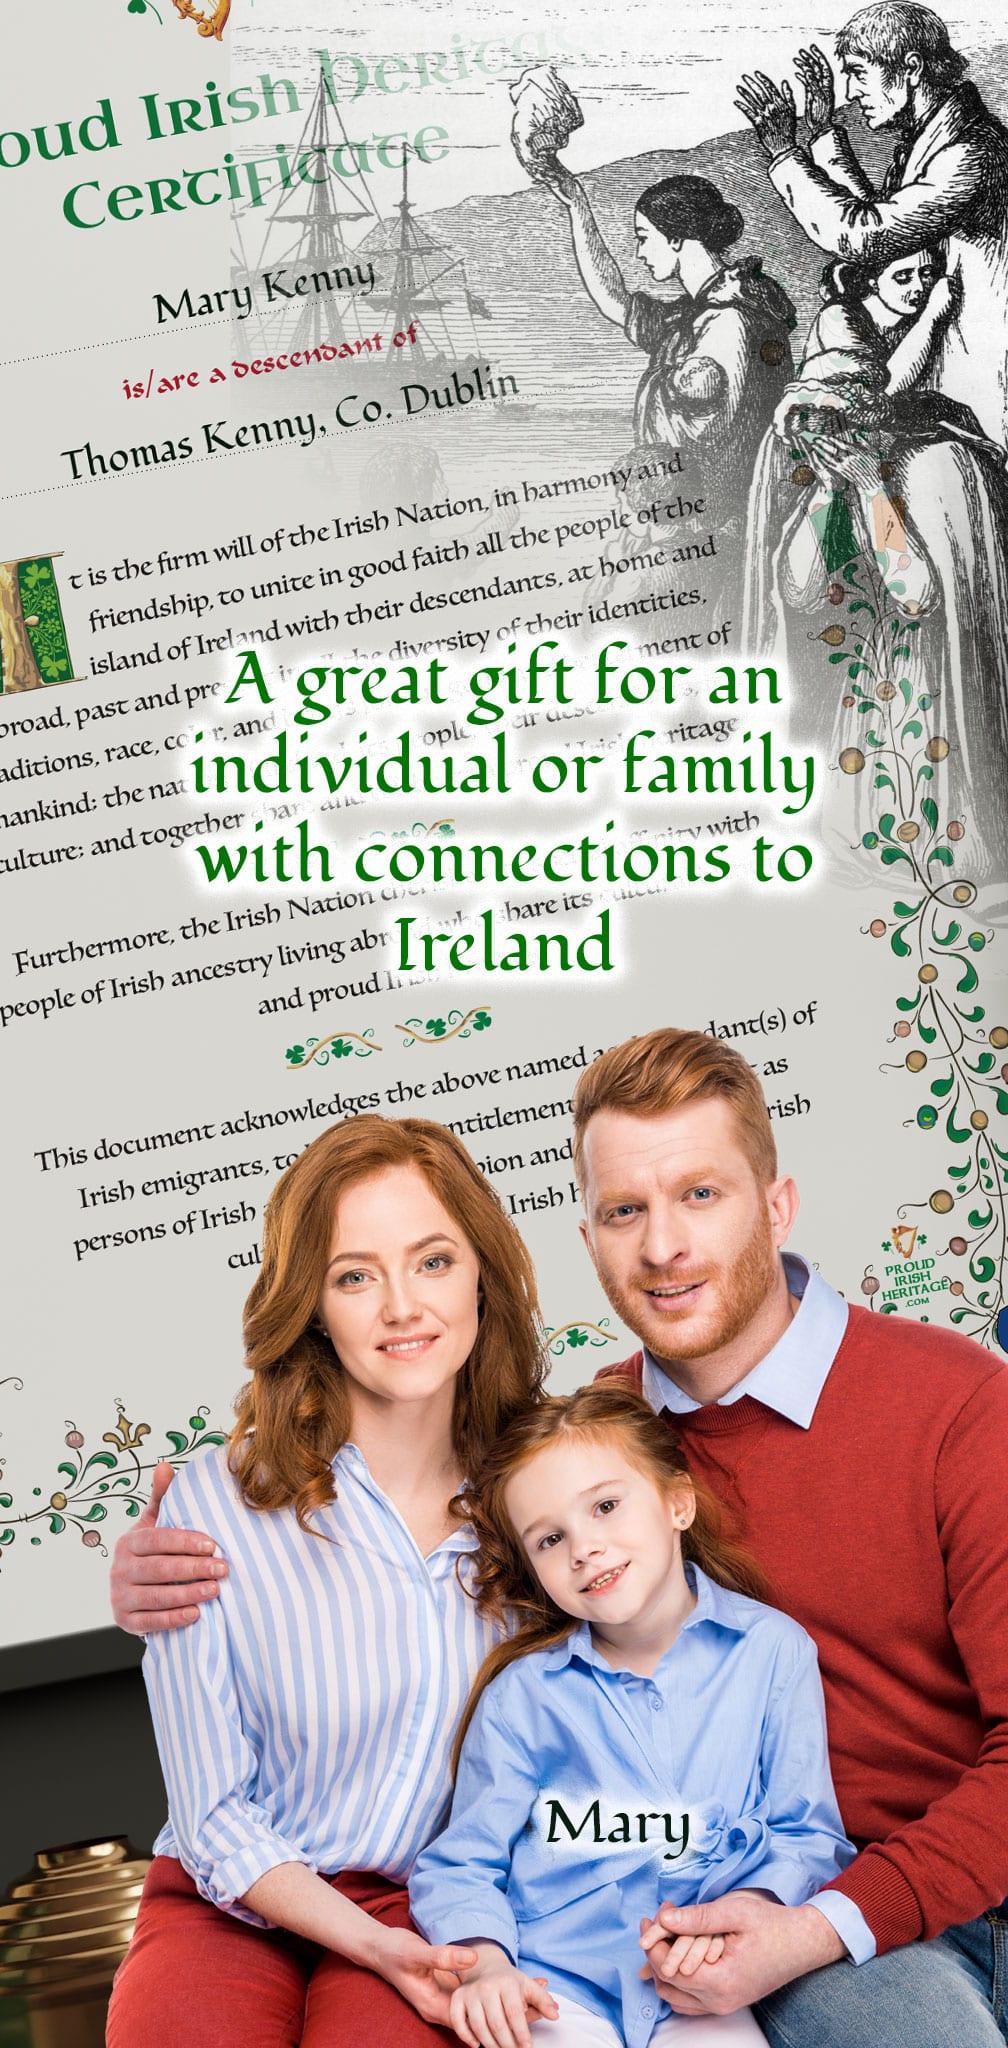 Proud Irish Heritage Gift- Fantastic gift for children